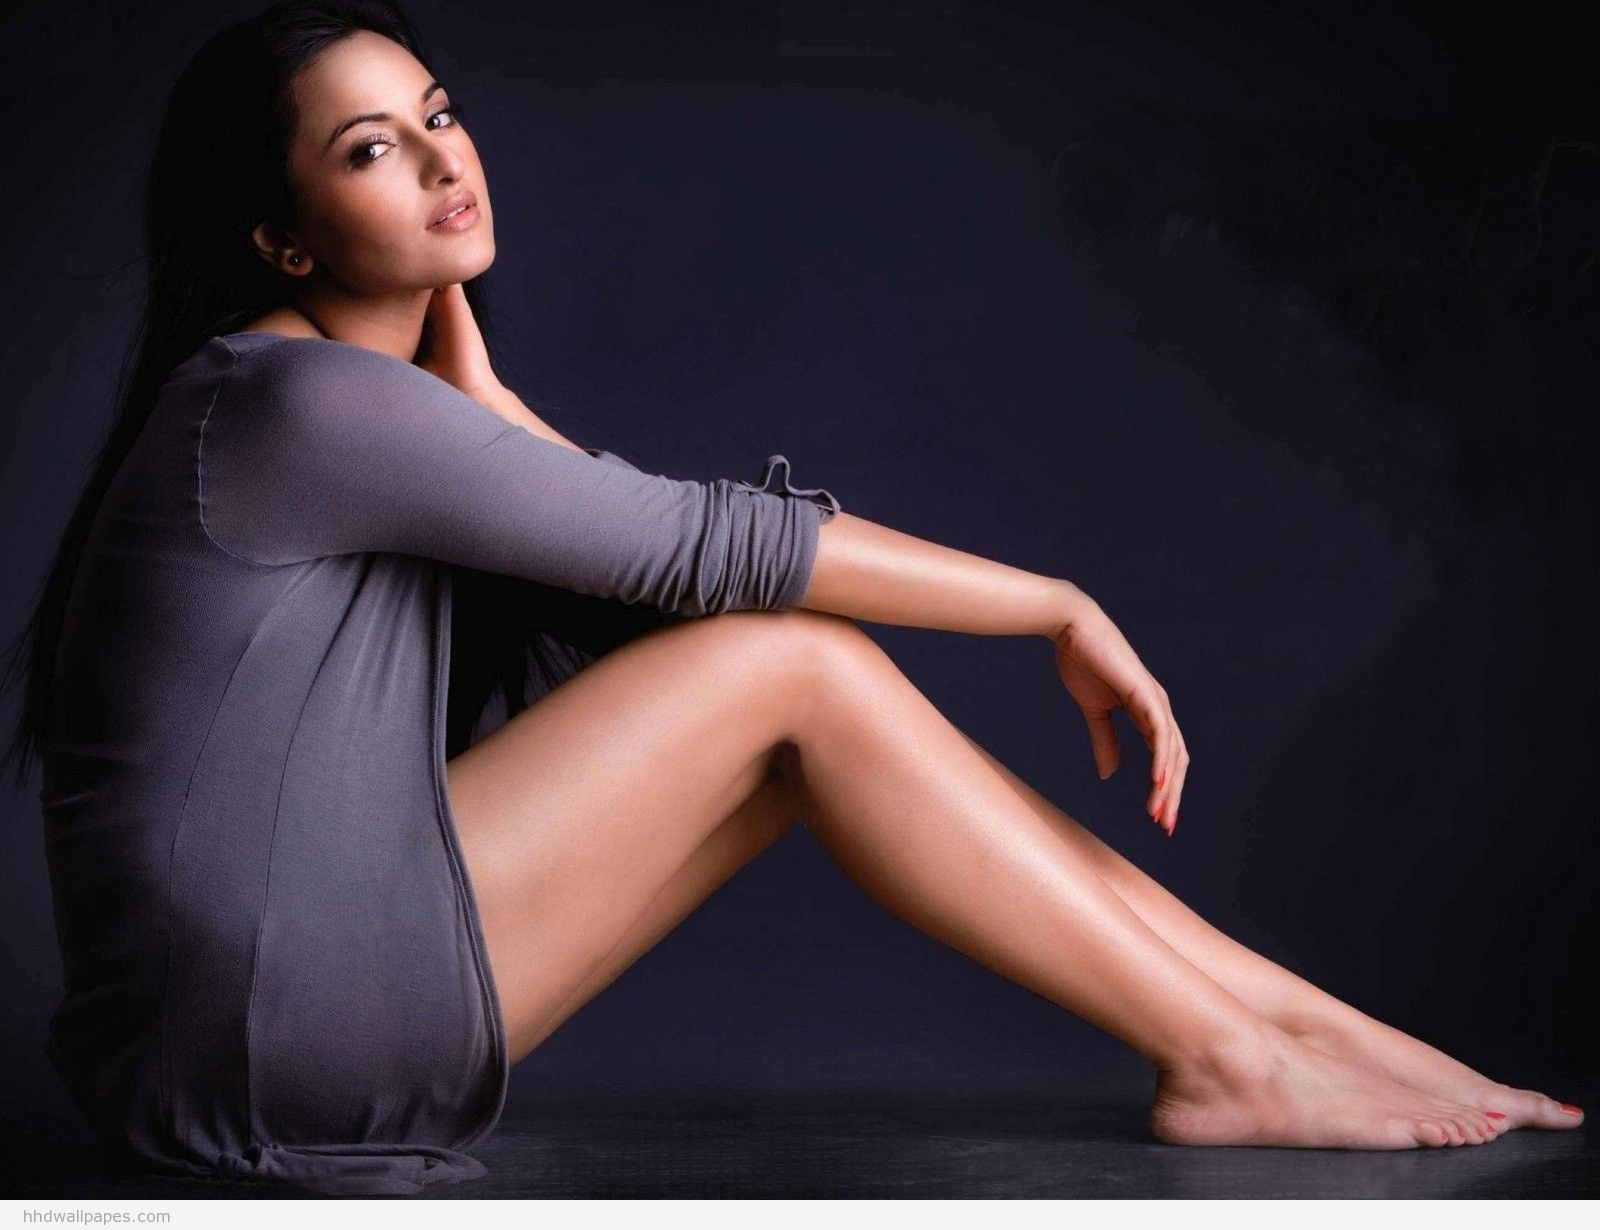 Sonakshi Sinha Hot  Sexy Hd Wallpaper  Images  Hd -8351